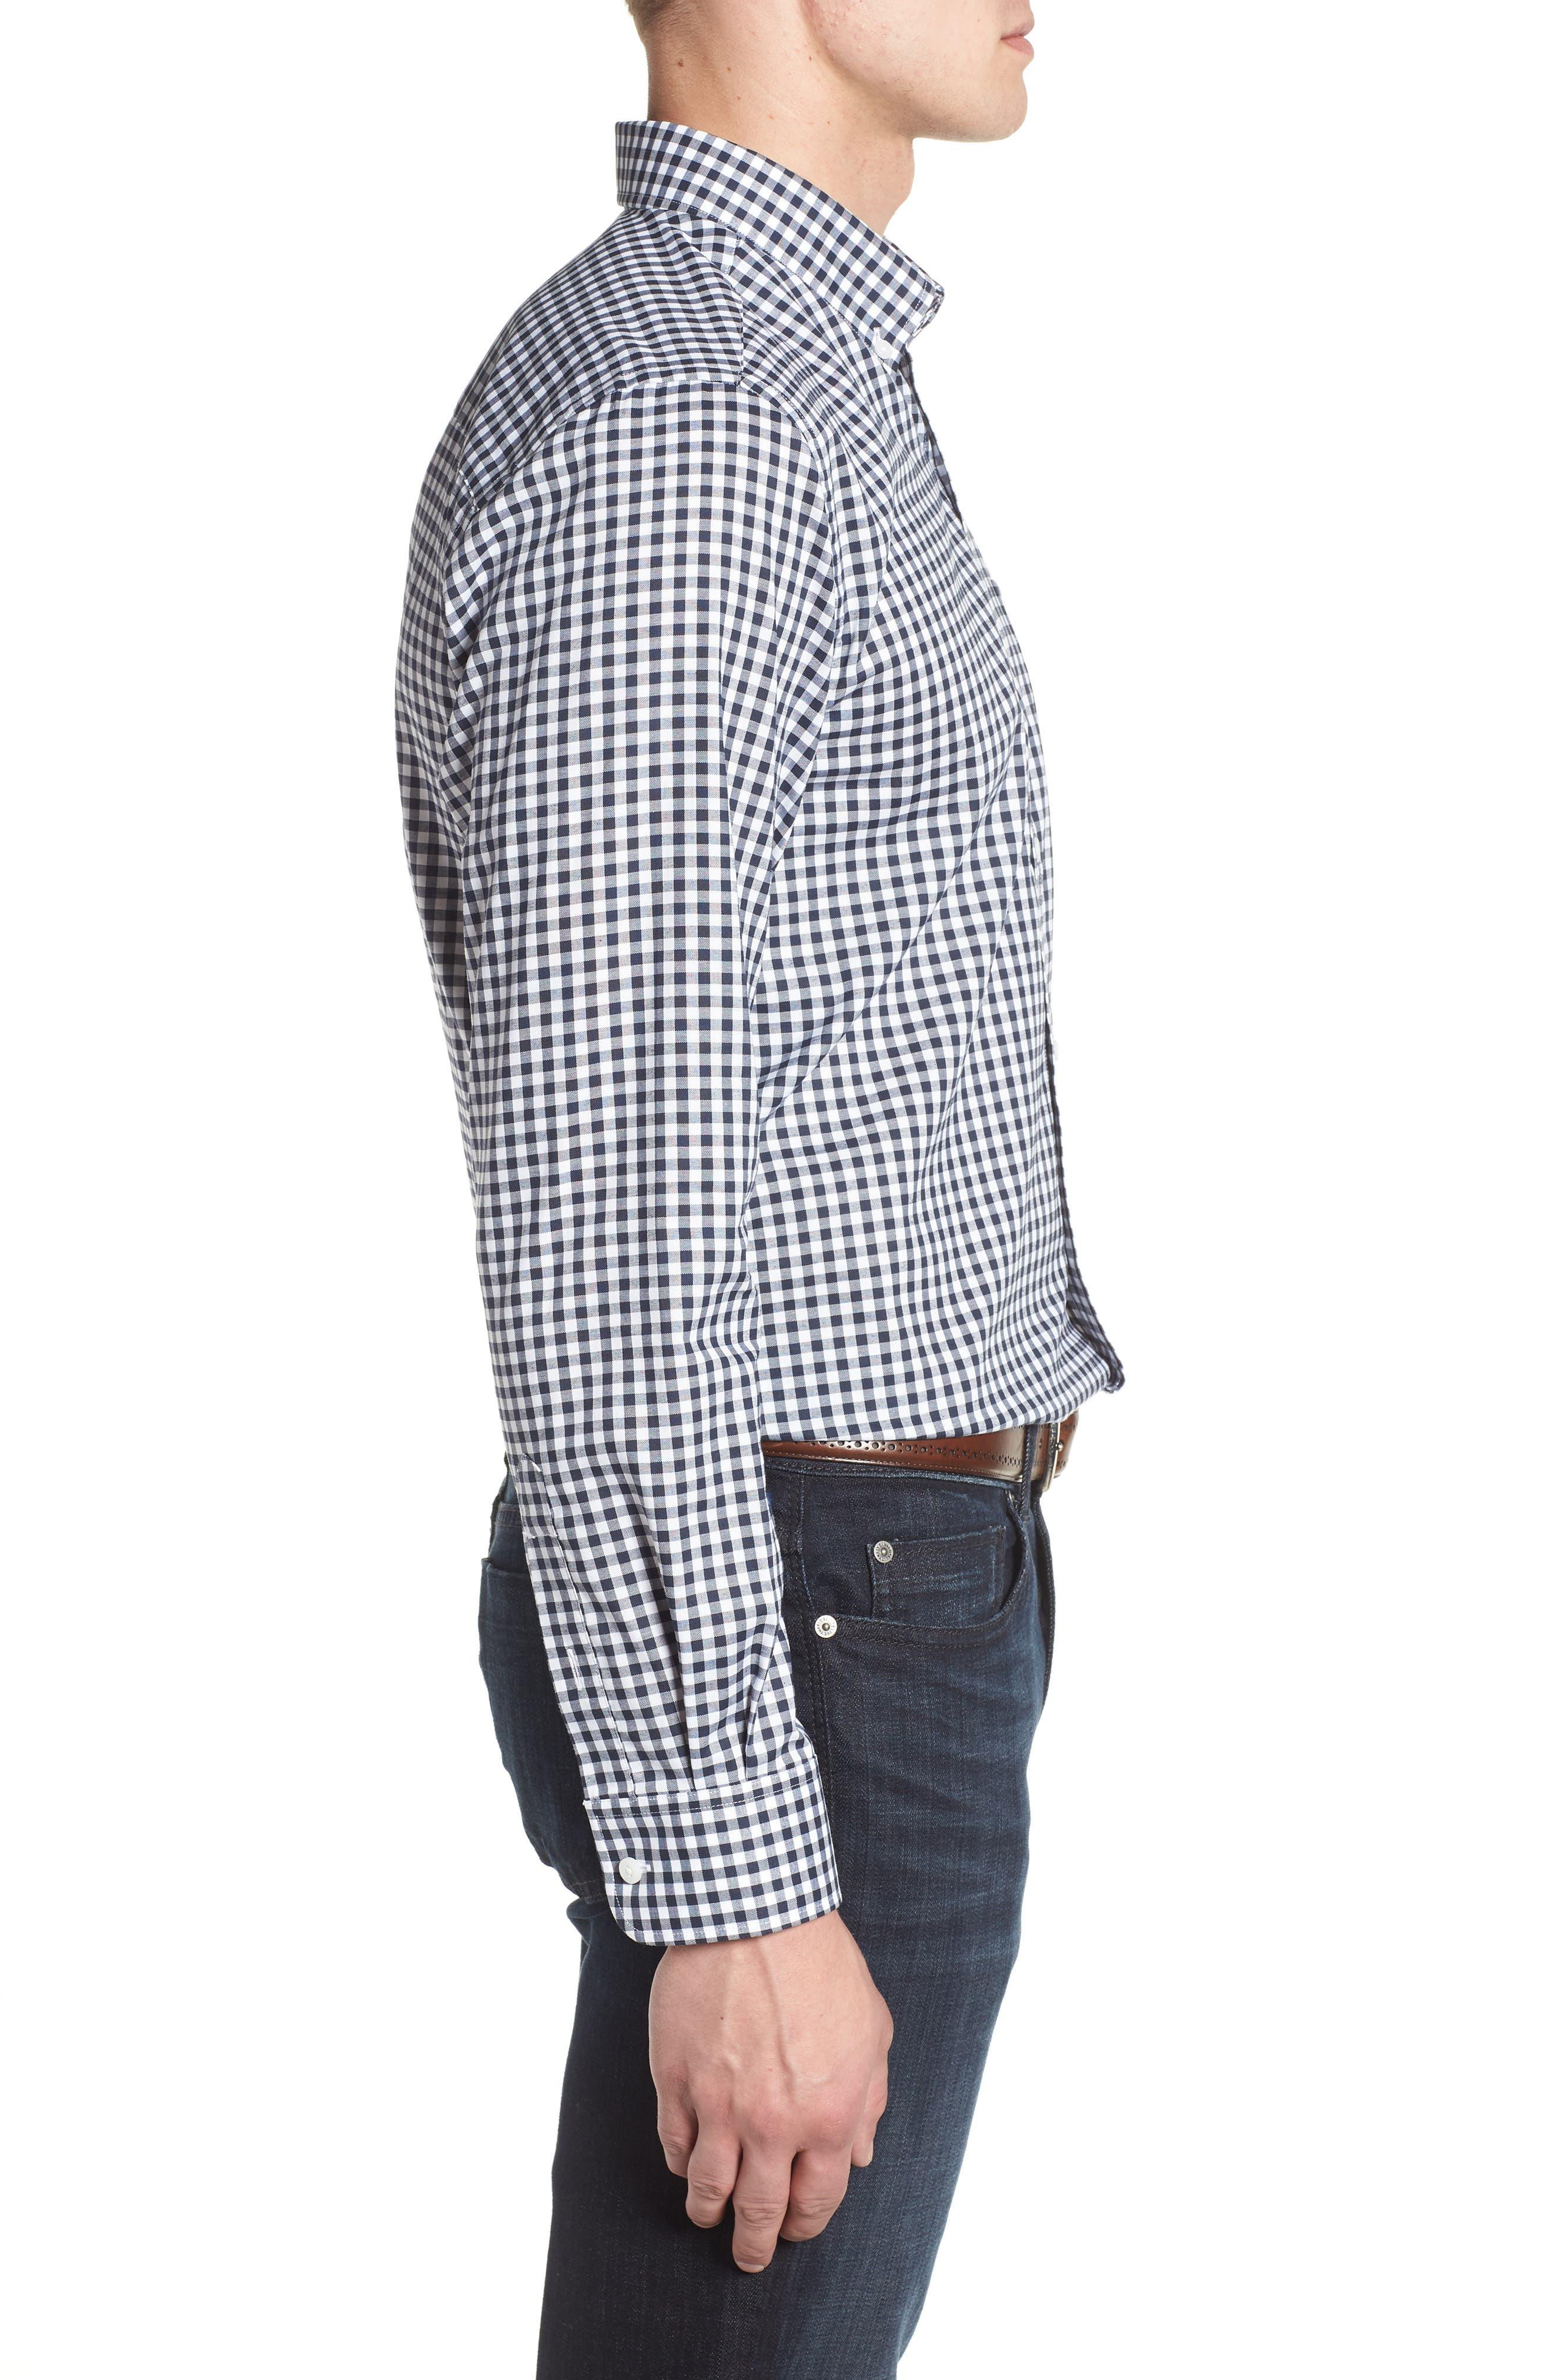 League Houston Texans Regular Fit Shirt,                             Alternate thumbnail 3, color,                             LIBERTY NAVY